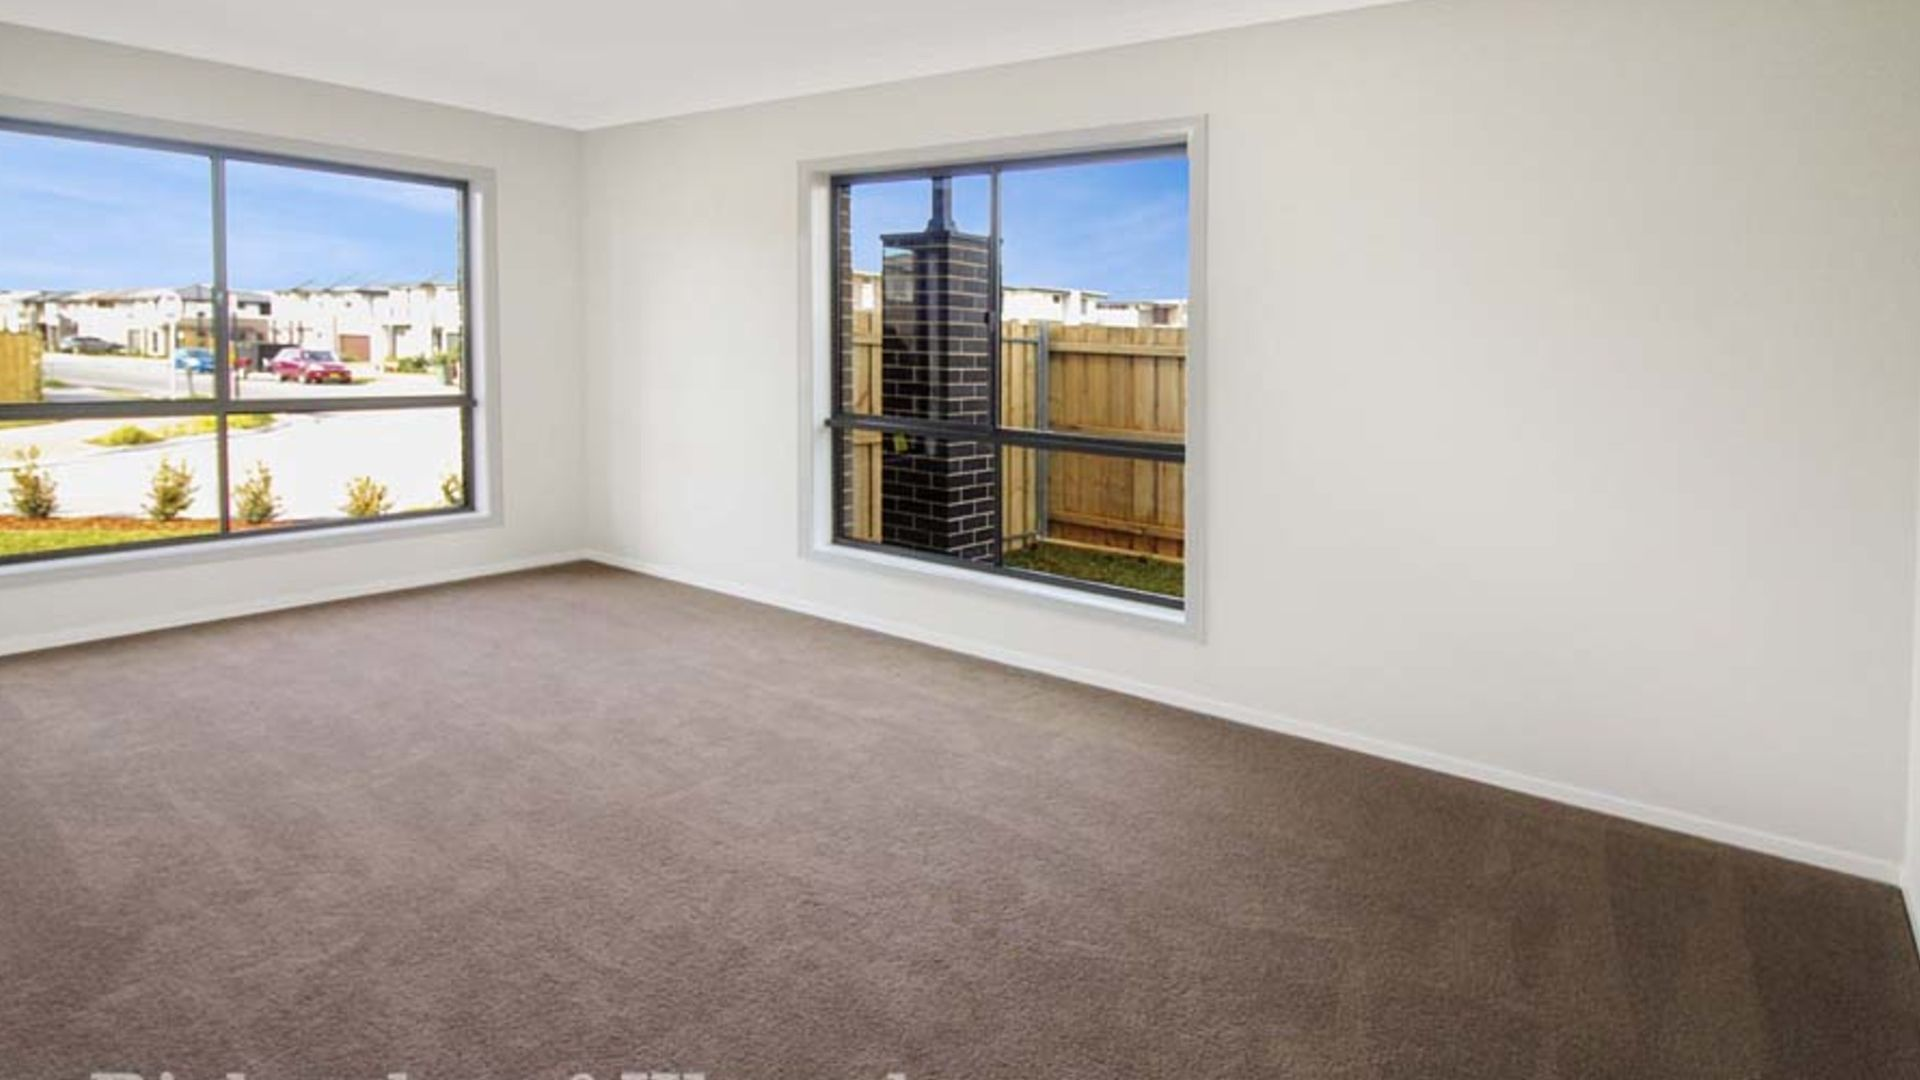 27 Apollo Street, Schofields NSW 2762, Image 1